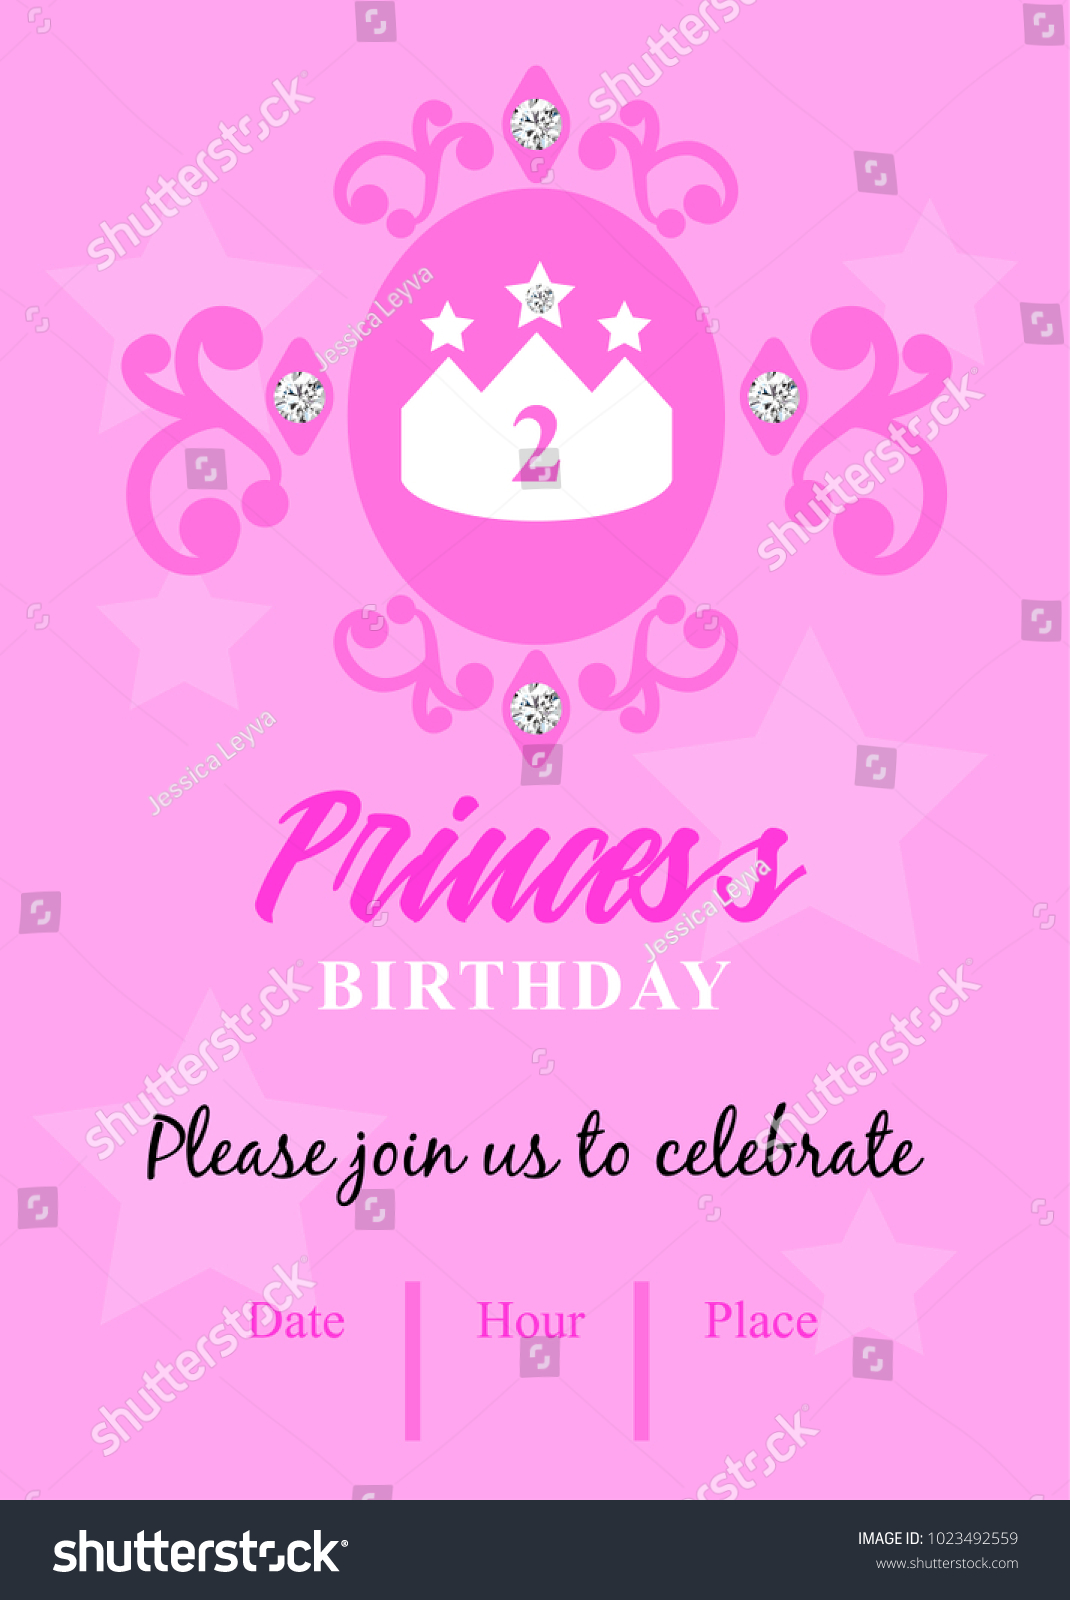 Second Birthday Party Invitation Princess